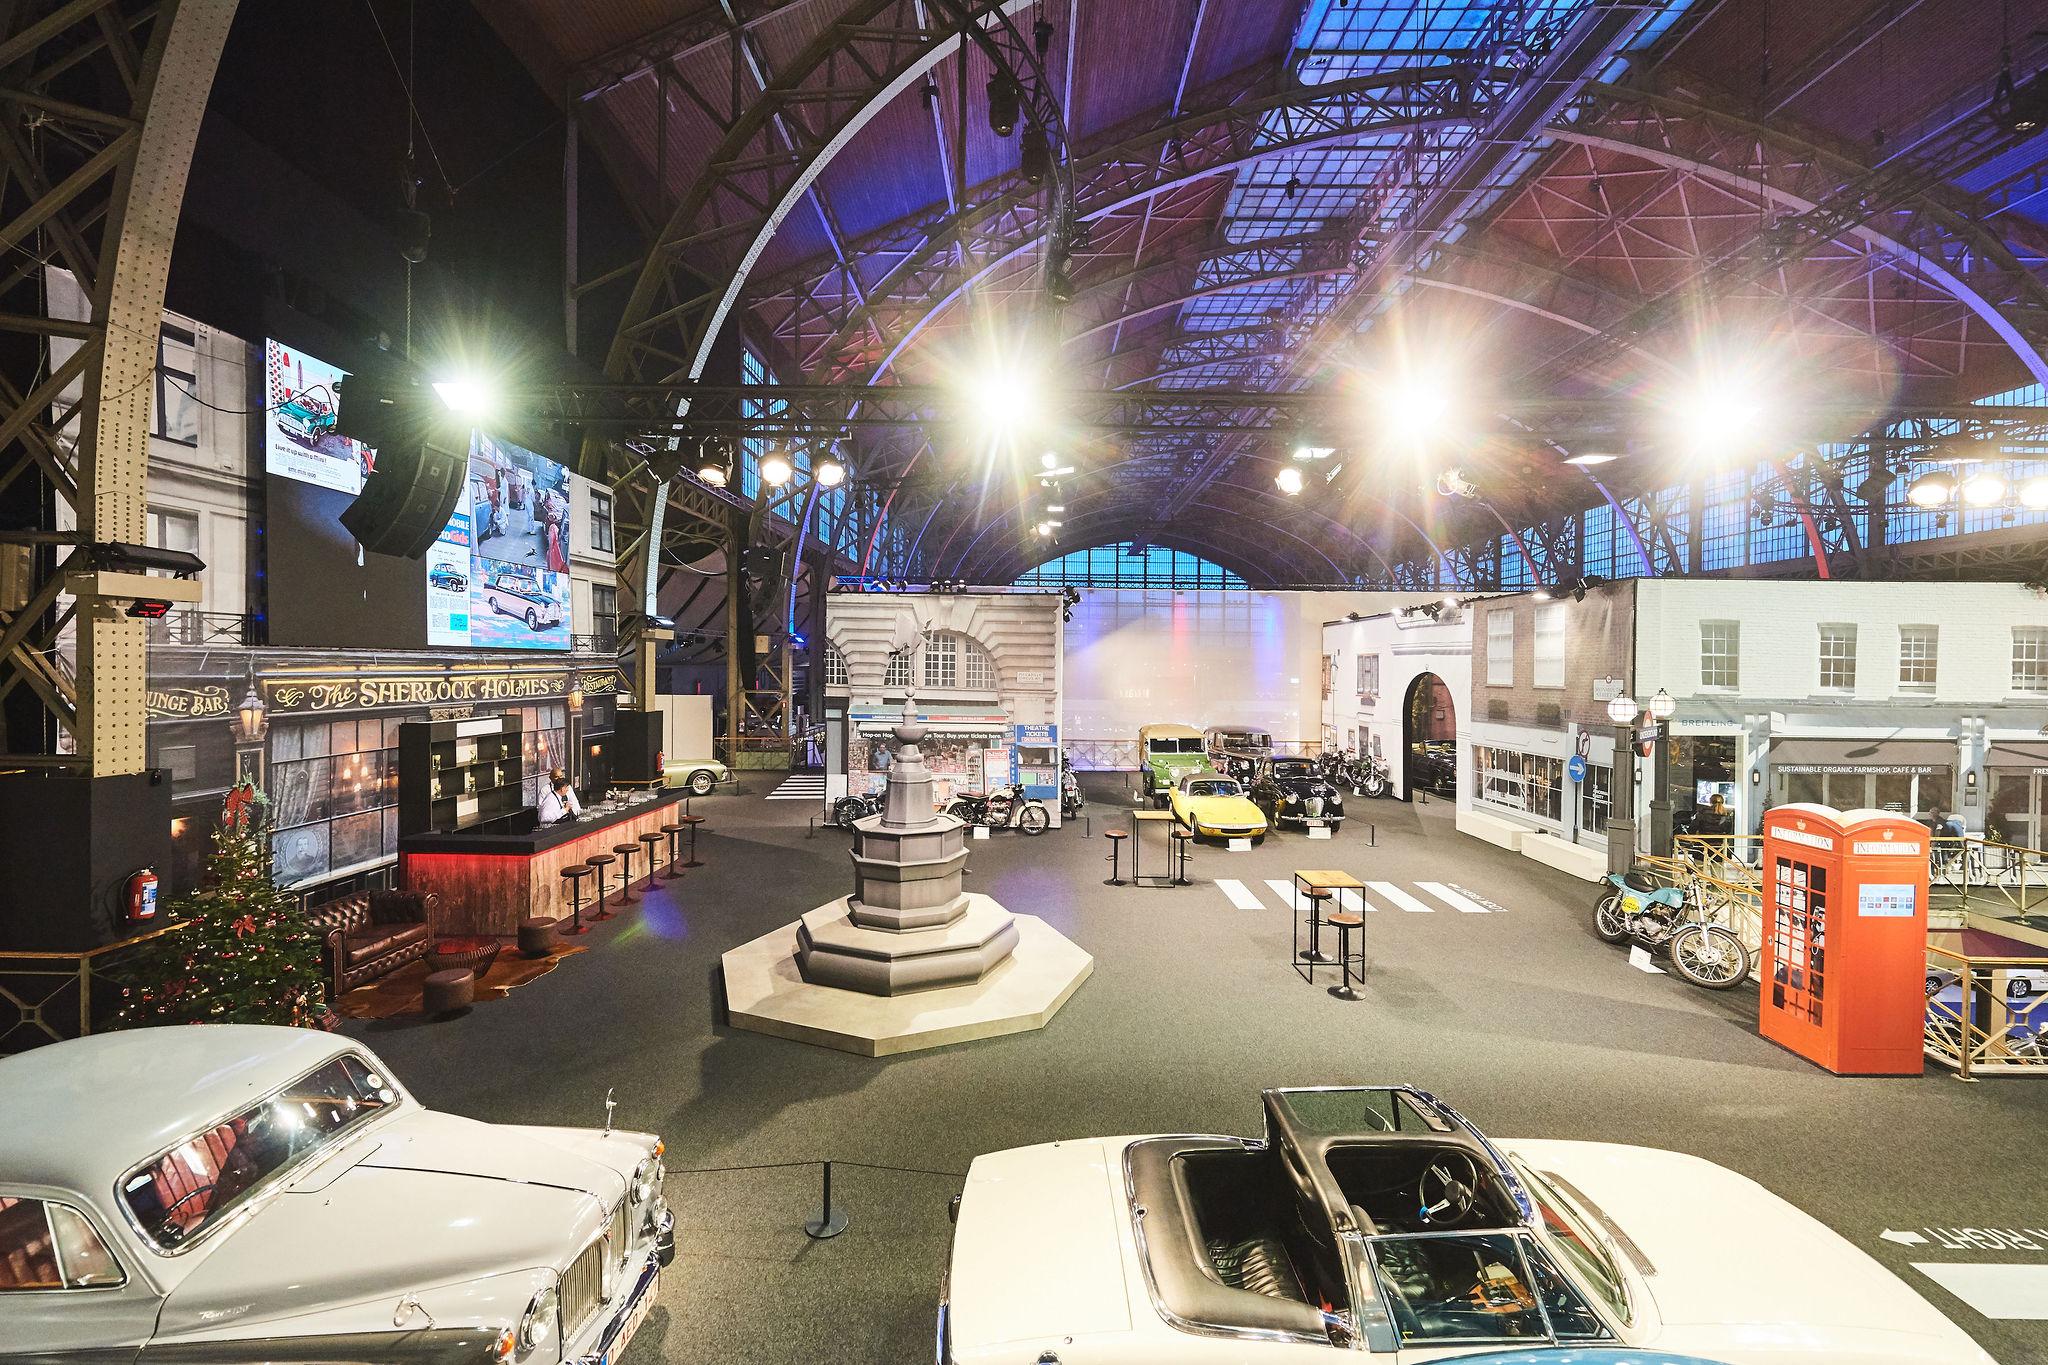 191212-Autoworld-So-British! exposition 16